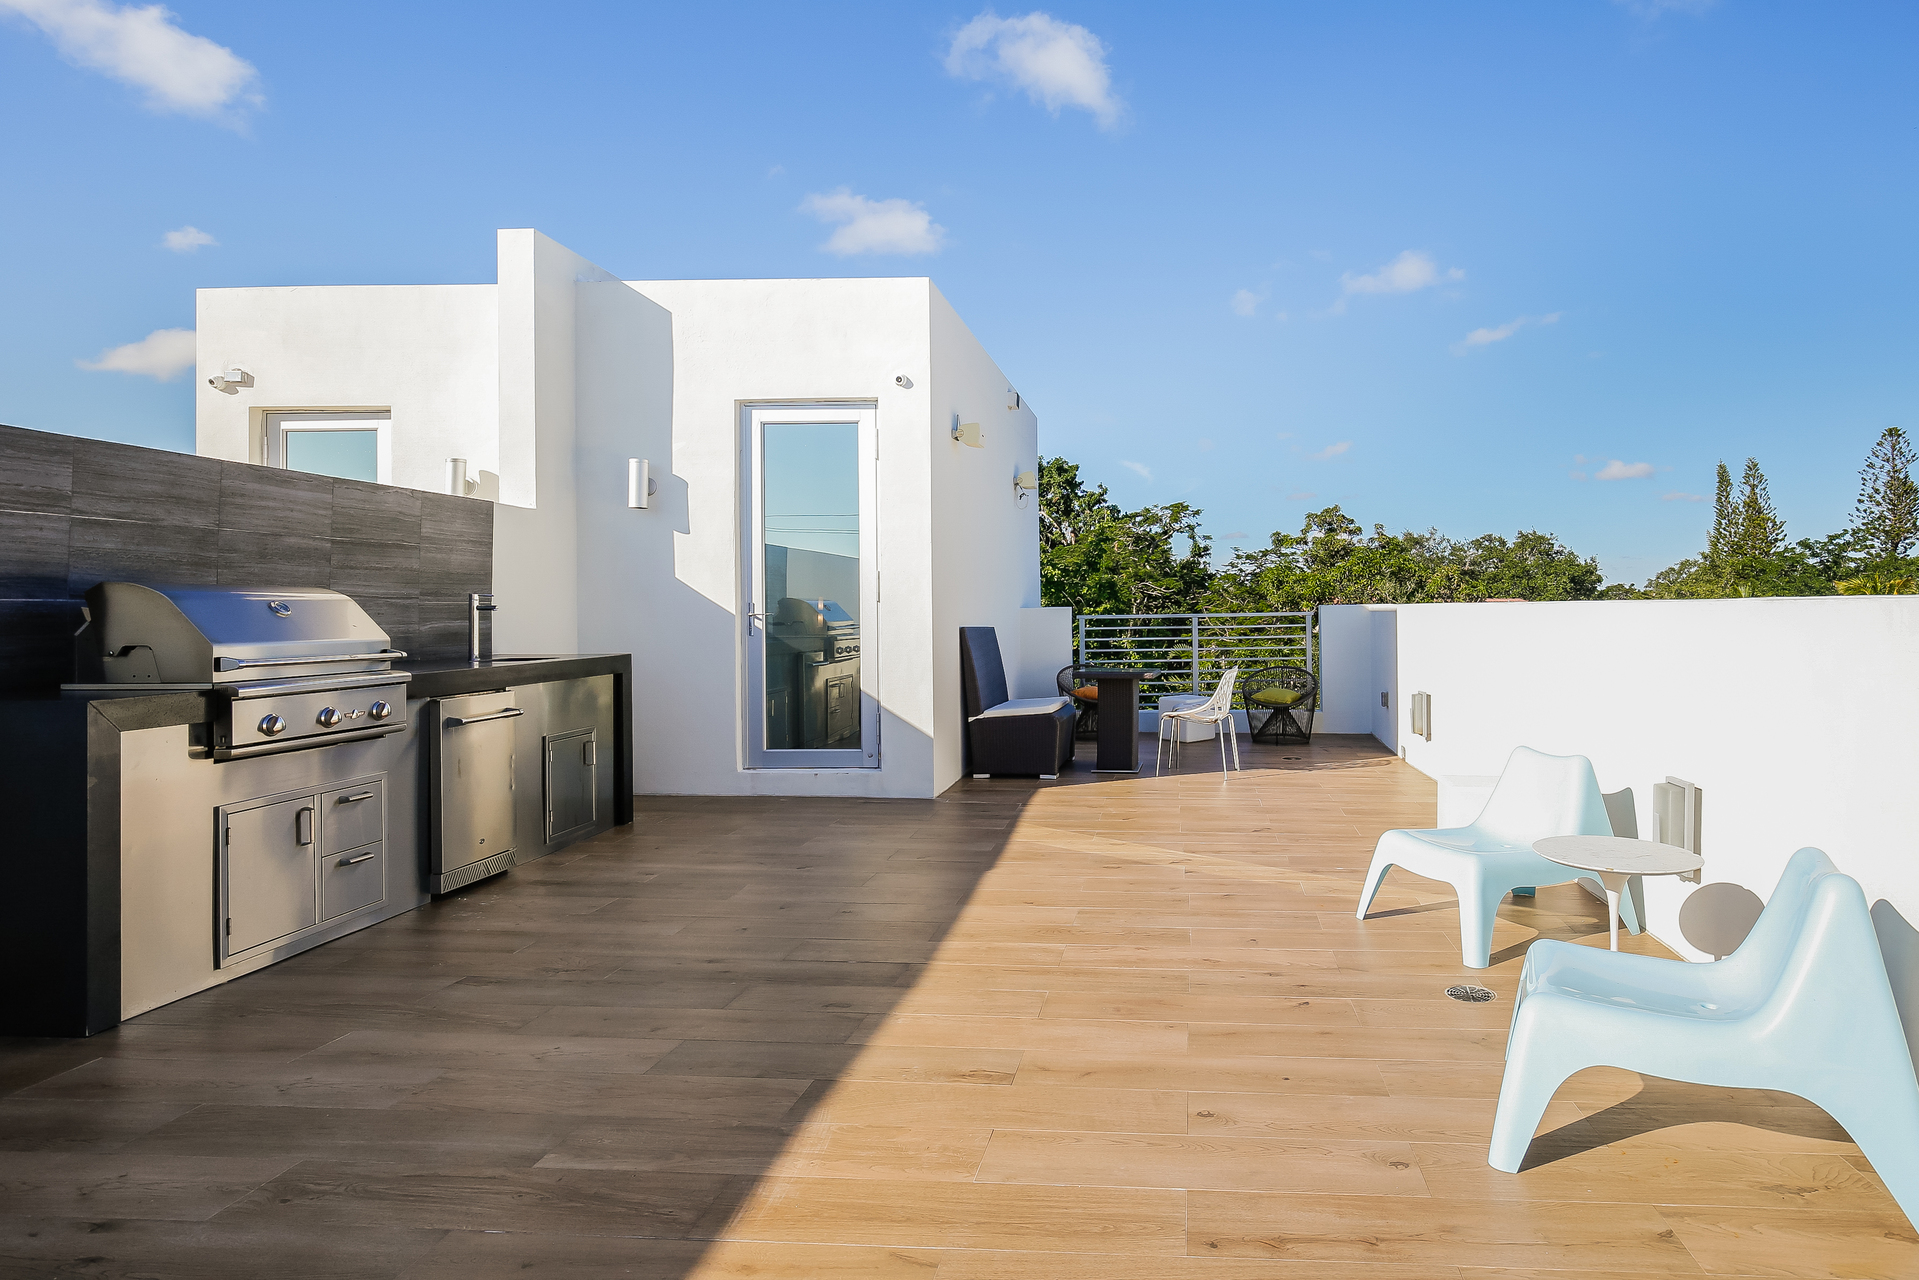 034-Roof_Terrace-5037905-medium